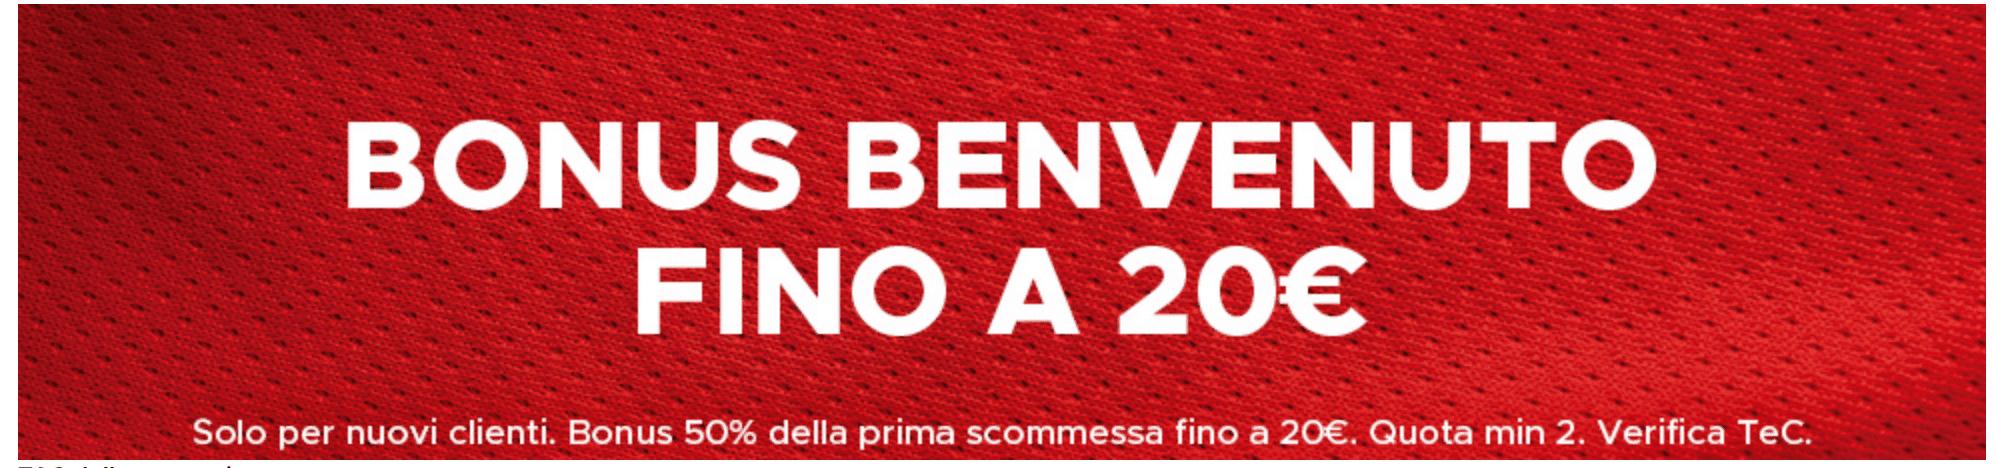 betclic bonus scommesse